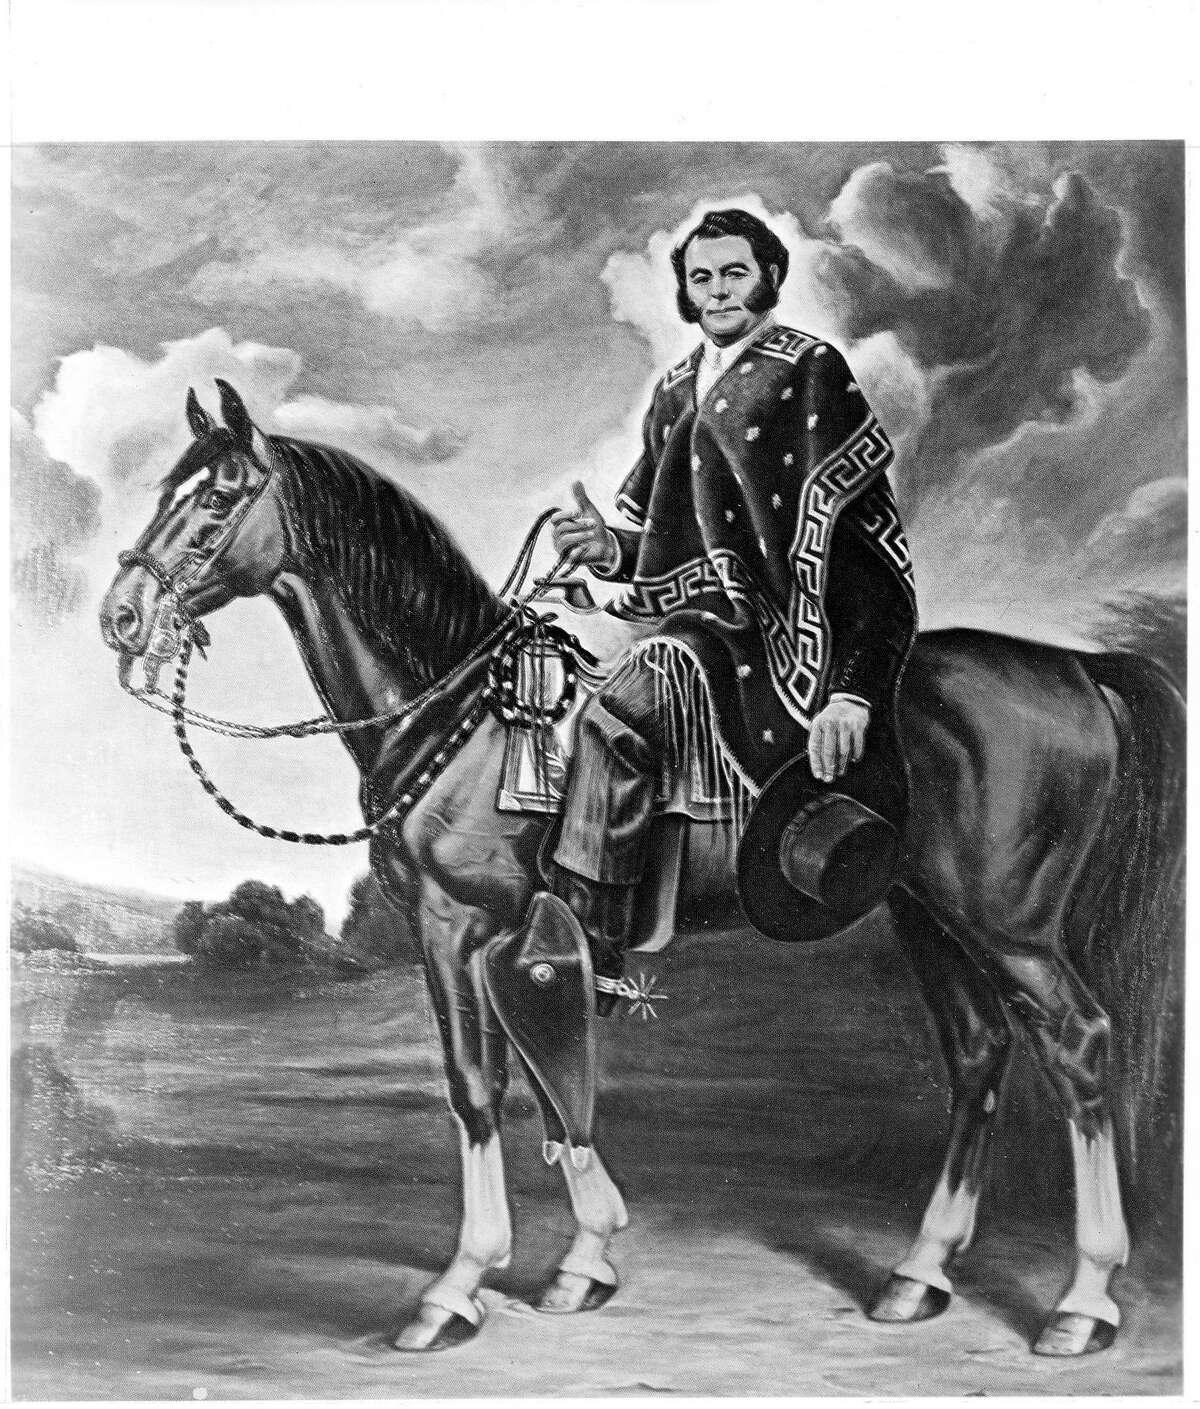 General Mariano Guadalupe Vallejo Handout photo ran 03/21/1976